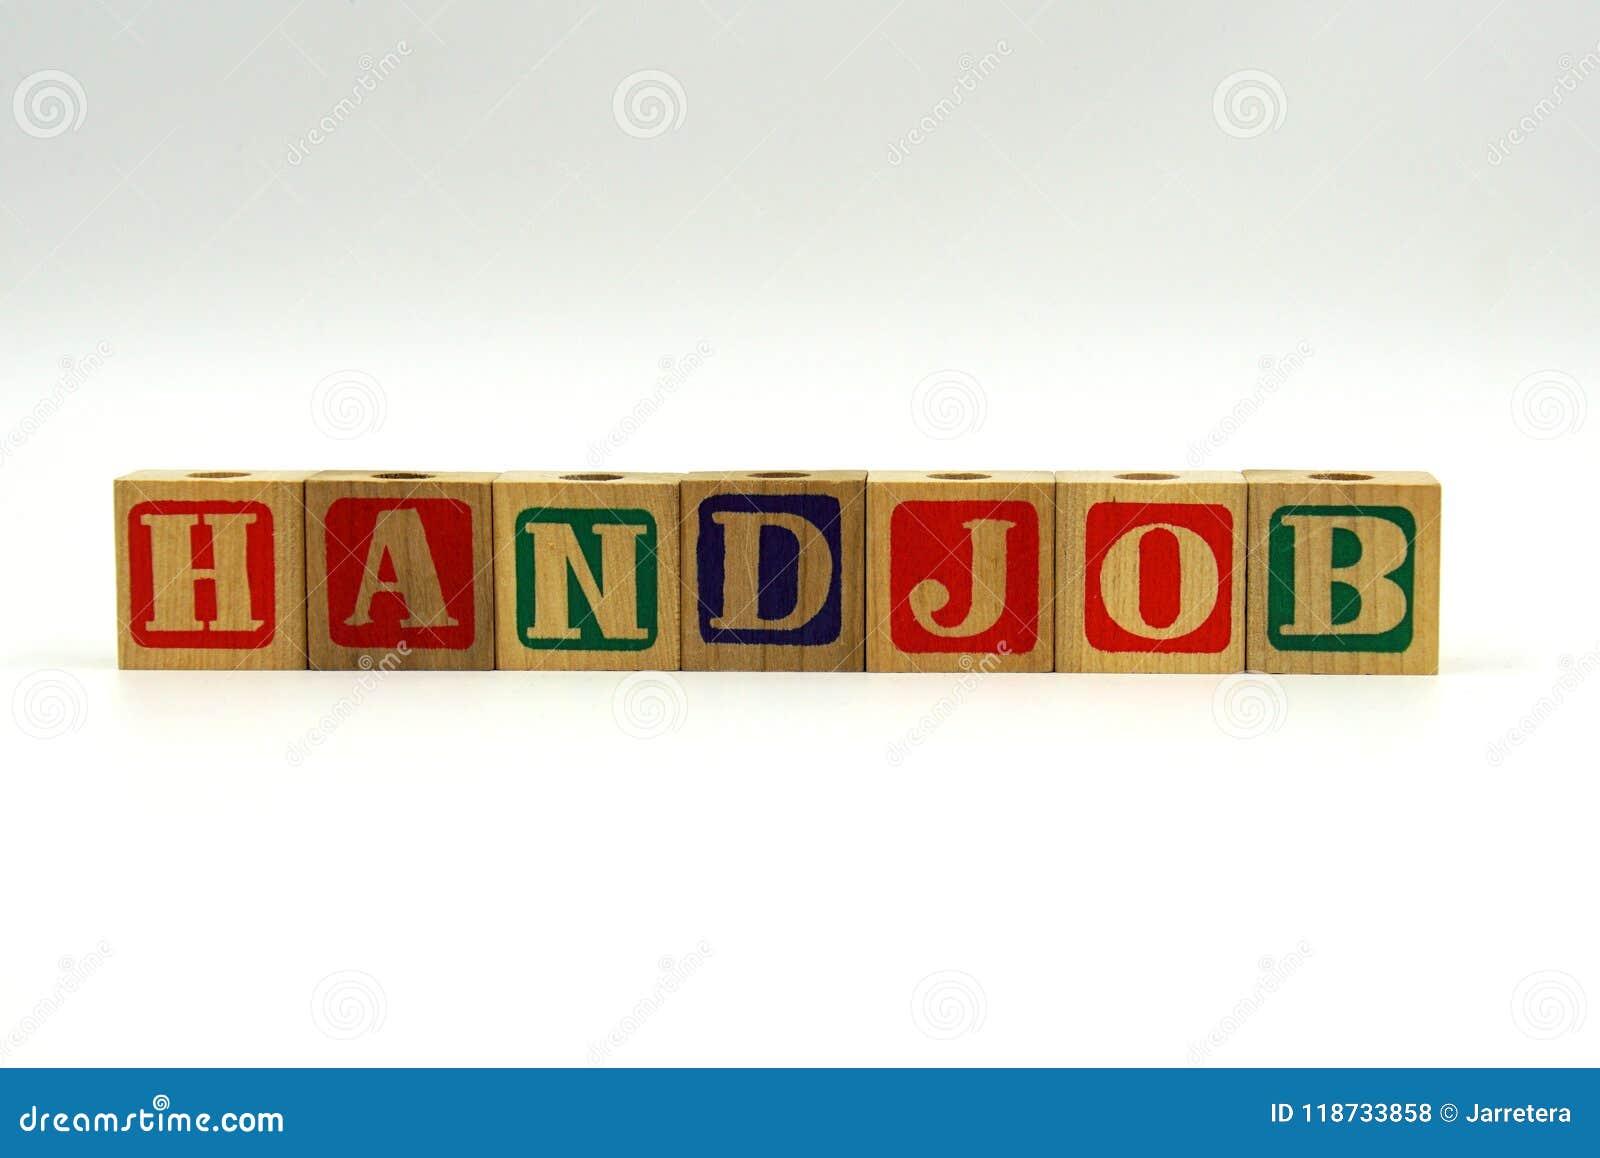 rough-free-young-girl-handjob